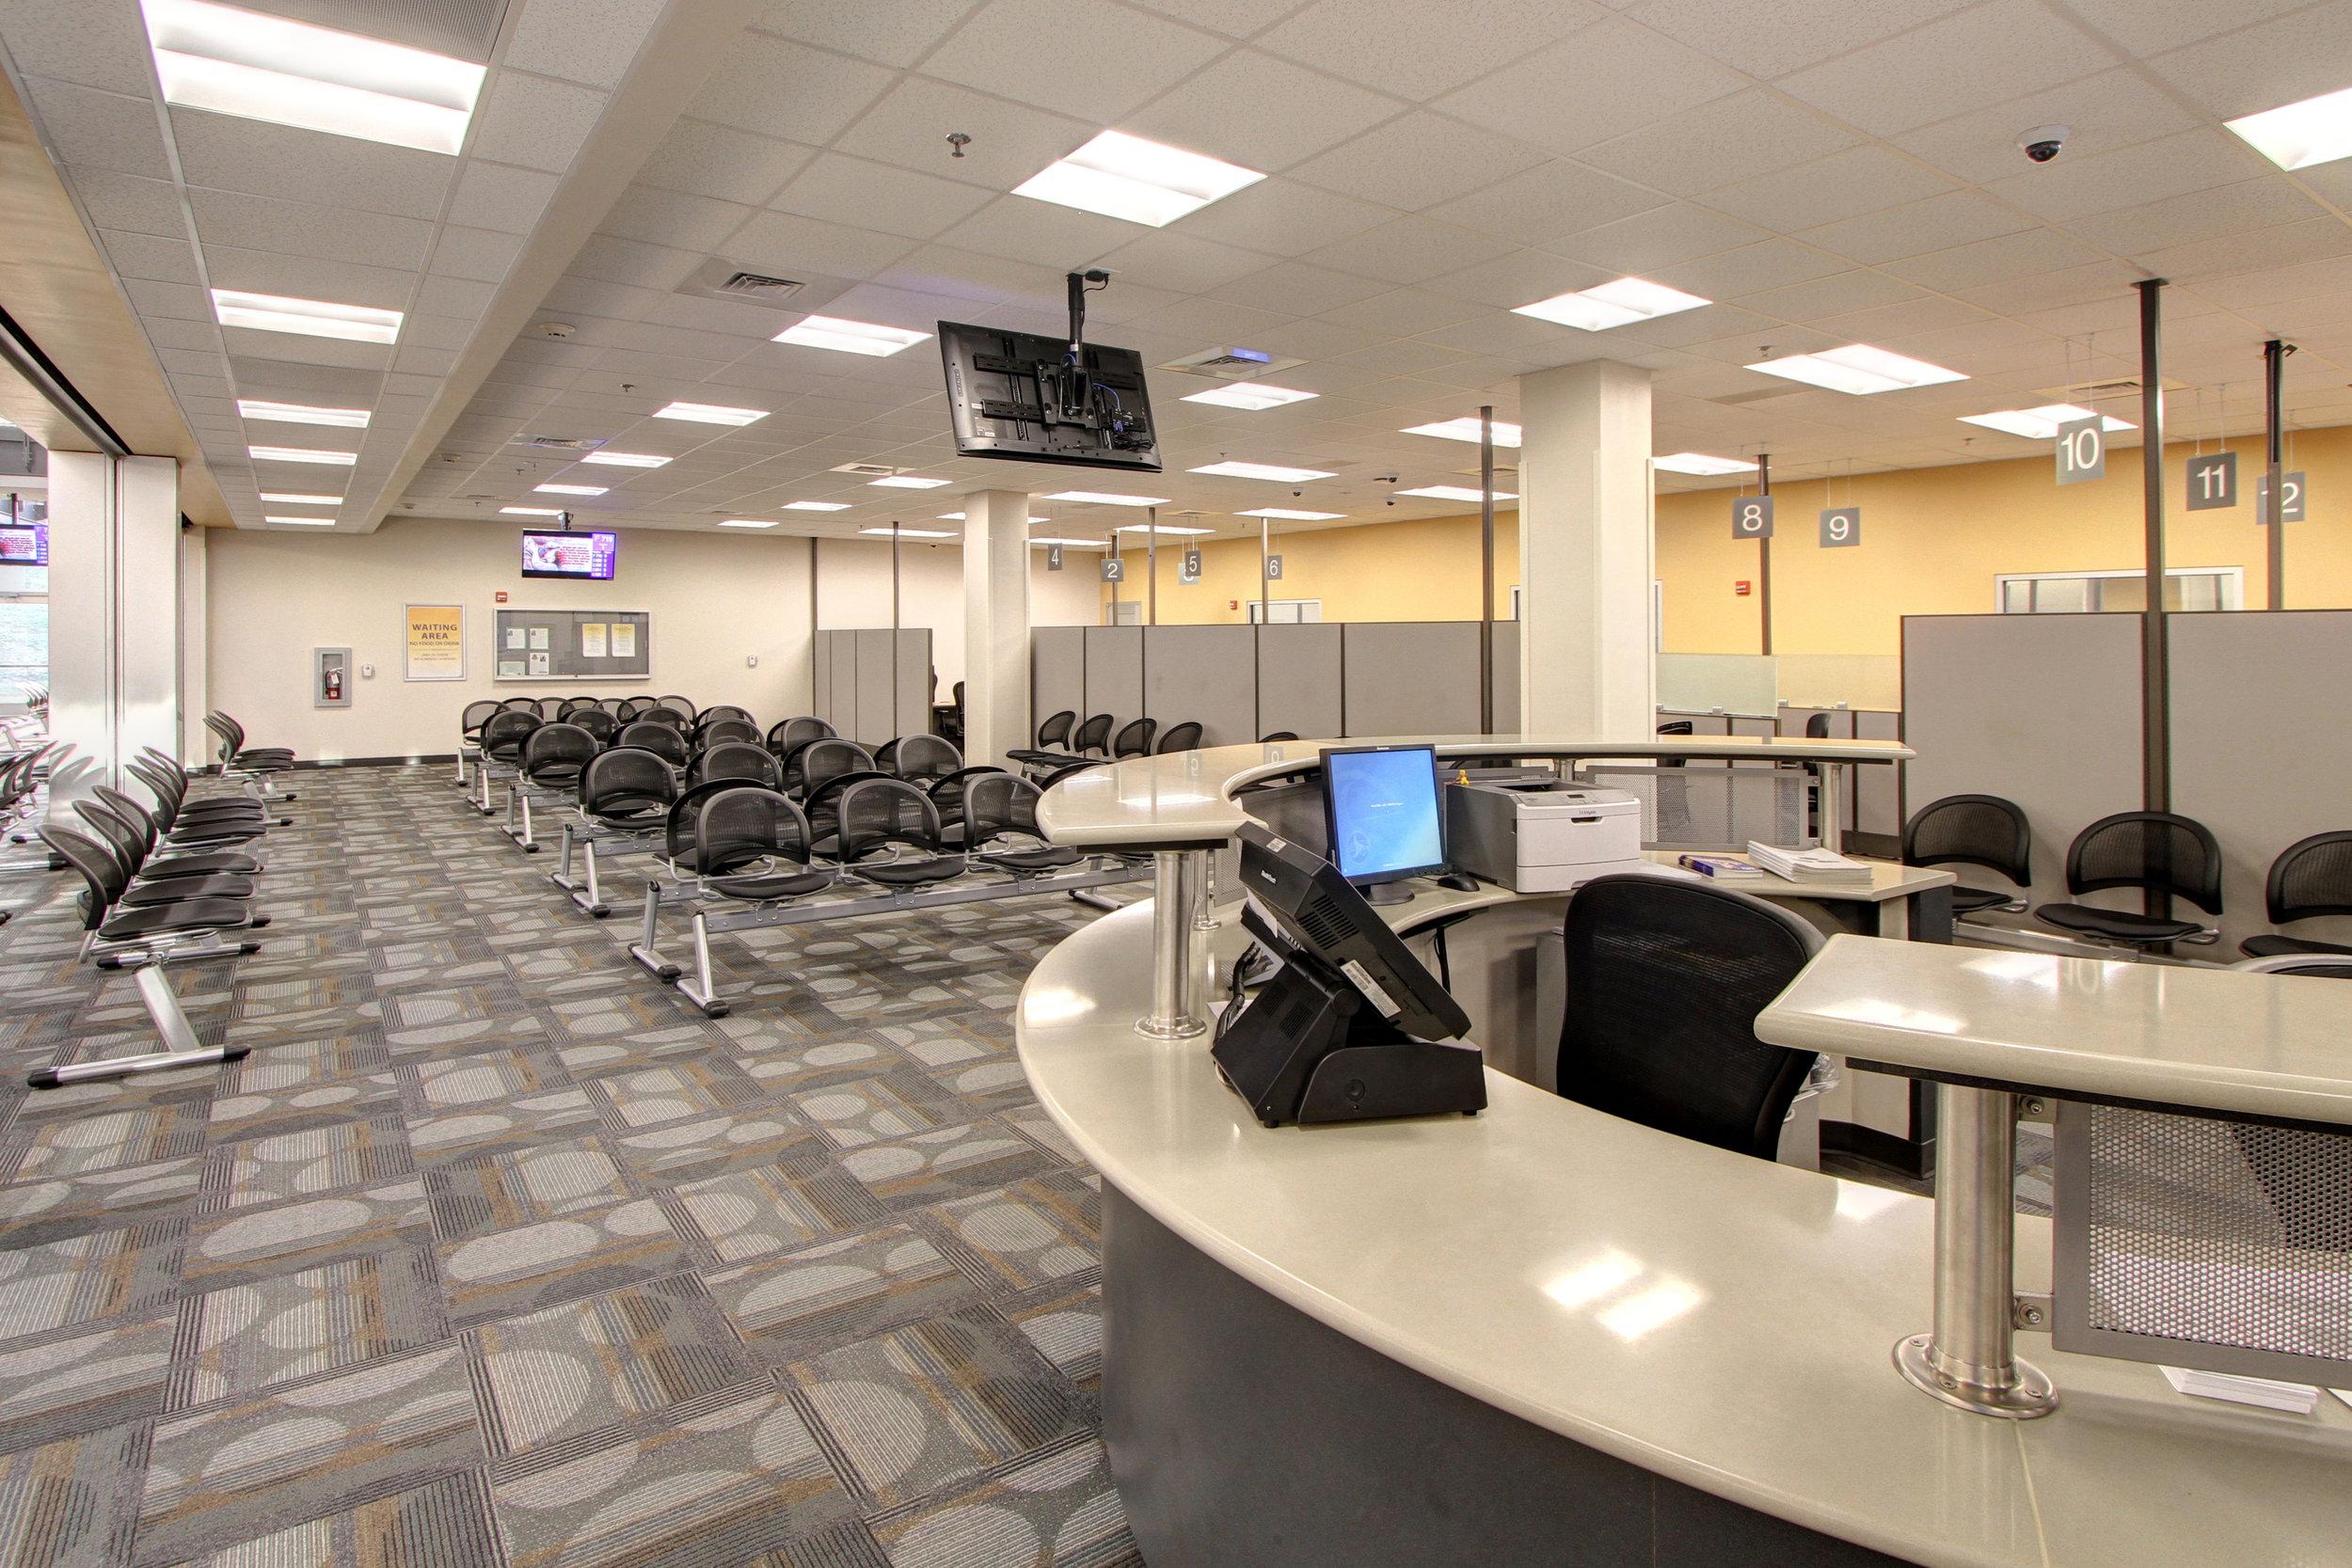 ADW-Public-Safety-Office-NC-DOT-DMV-SHP-Huntersville-NC-Interior-1.JPG